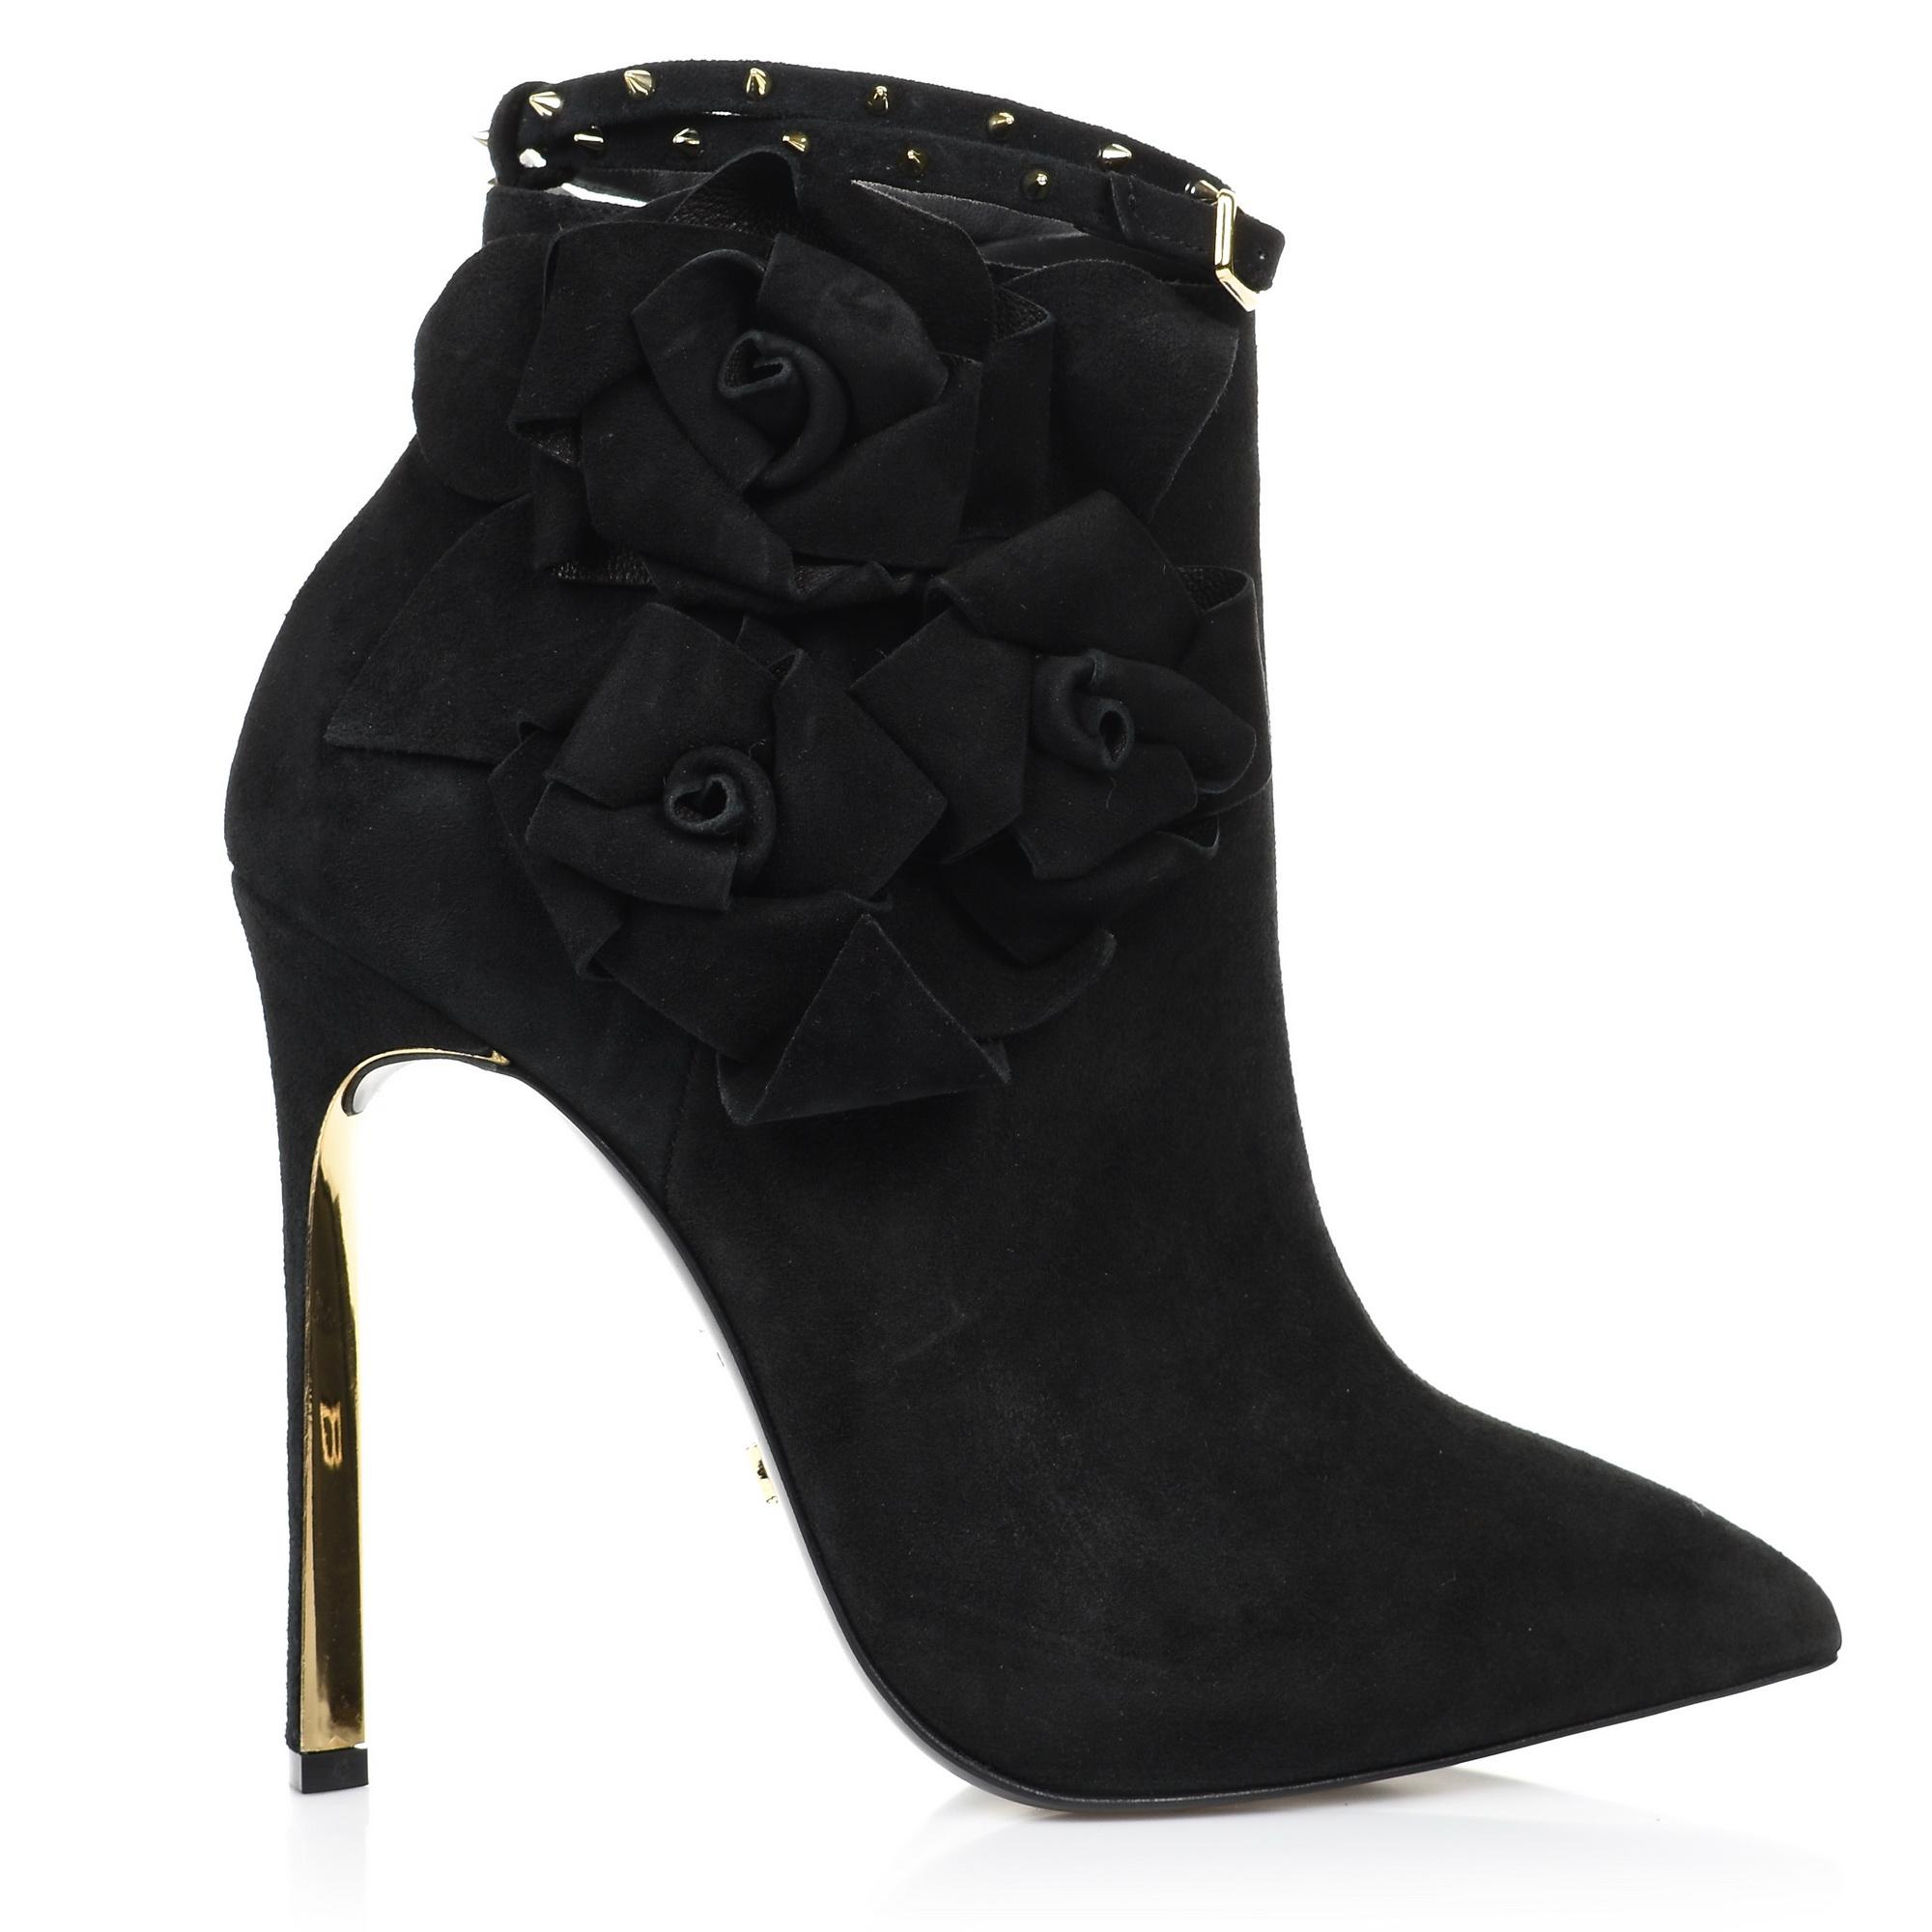 Suede Δερμάτινες Γόβες Dukas Twist Booties Roses 5.DTBR γυναικα   γυναικείο παπούτσι